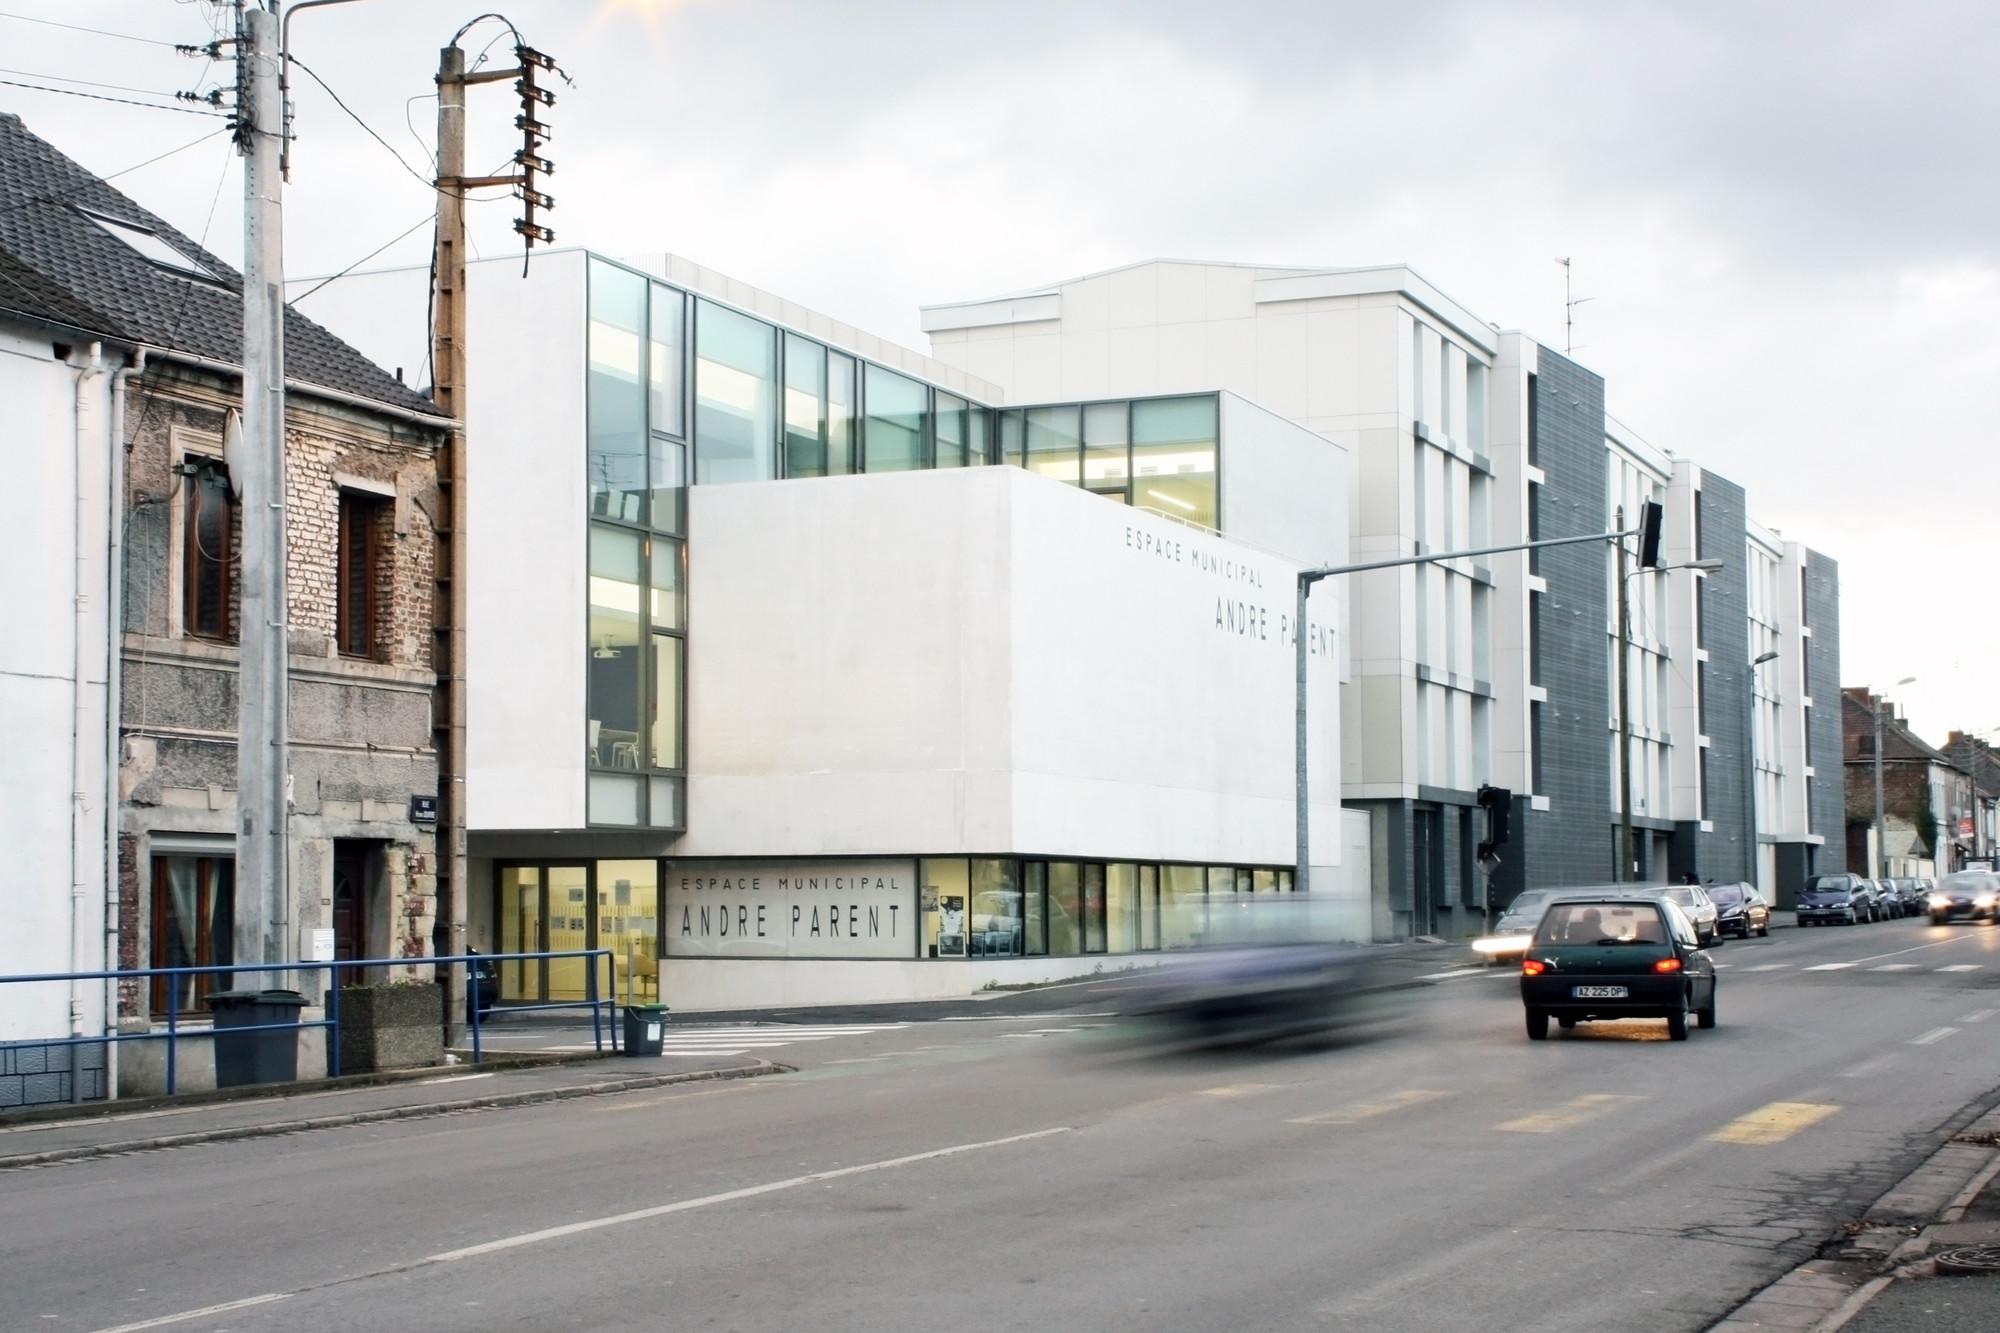 Galer a de centro cultural andr parent olivier werner for Parent architecte